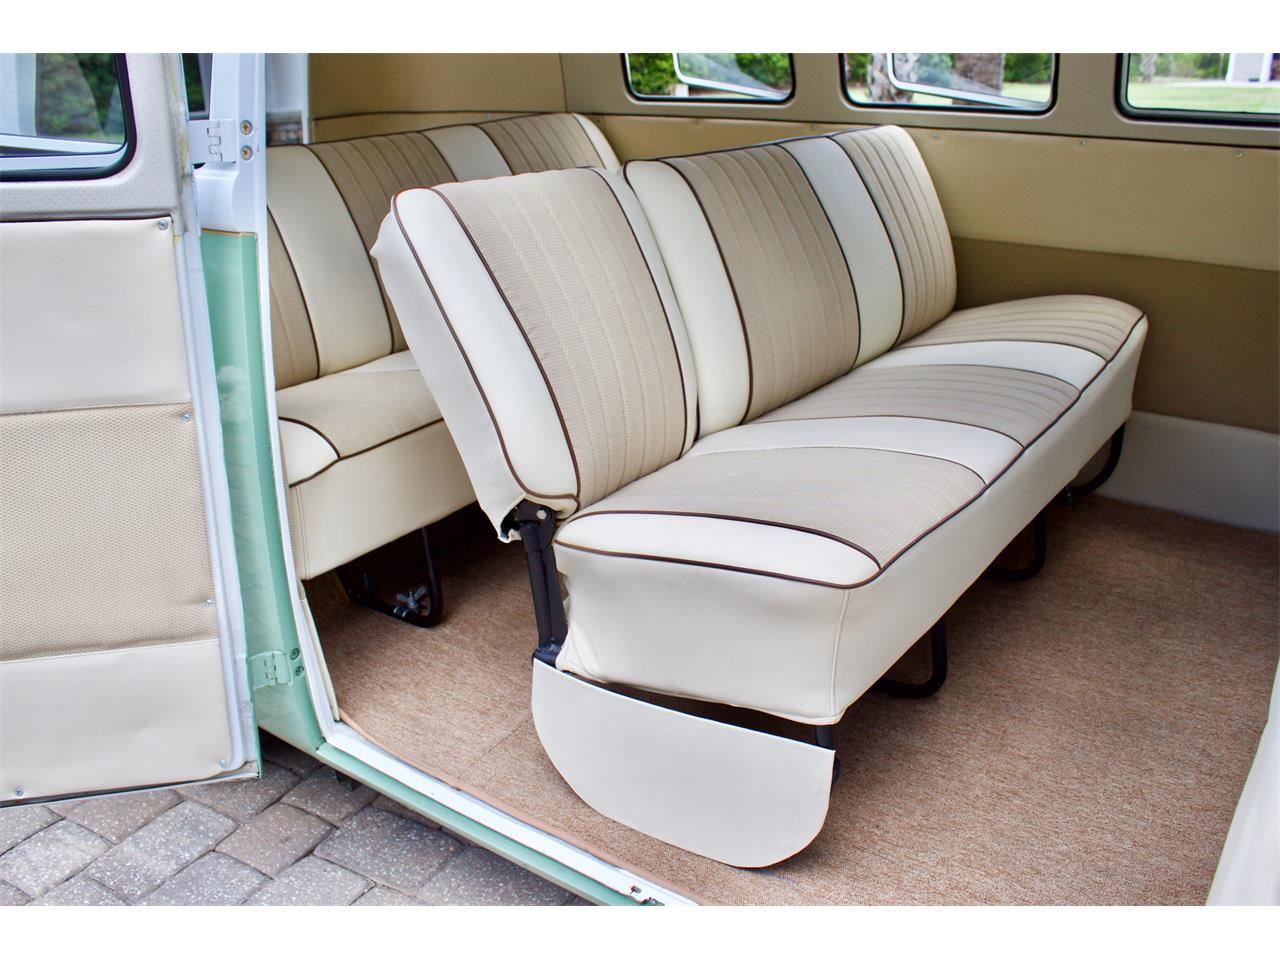 Large Picture of Classic 1962 Volkswagen Bus located in eustis Florida - $59,950.00 - Q2DH